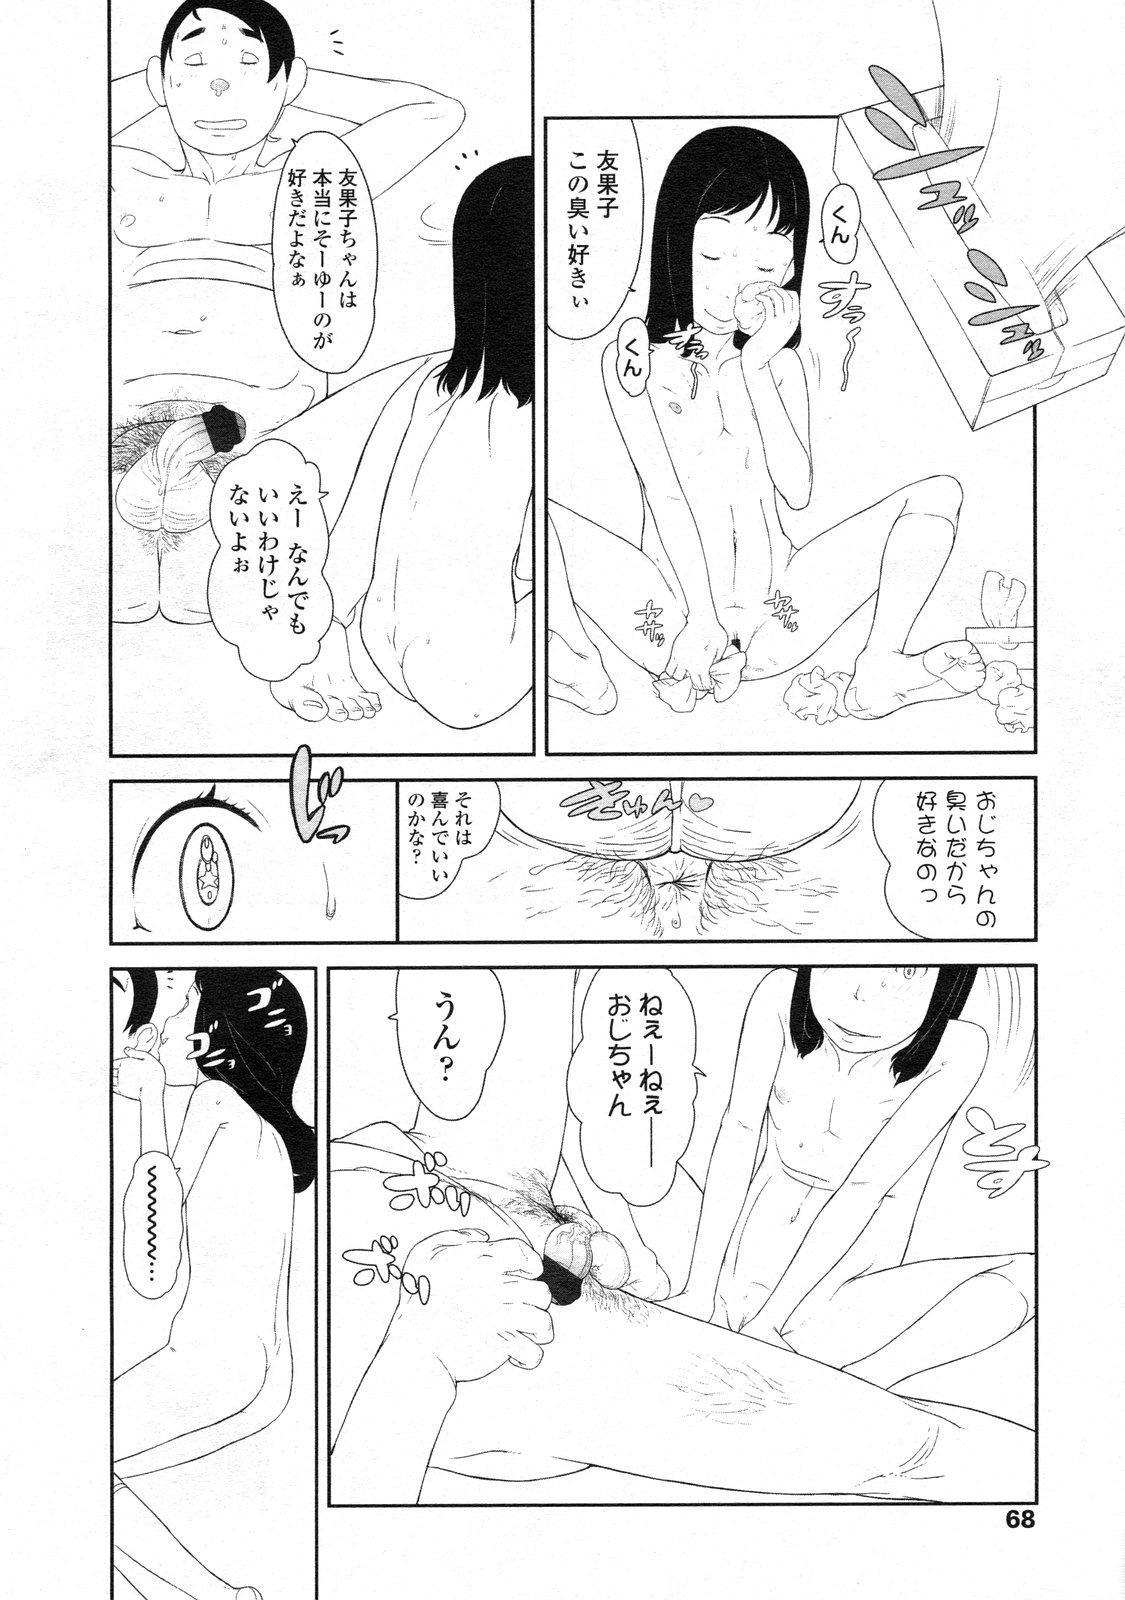 COMIC LO 2009-09 Vol. 66 68